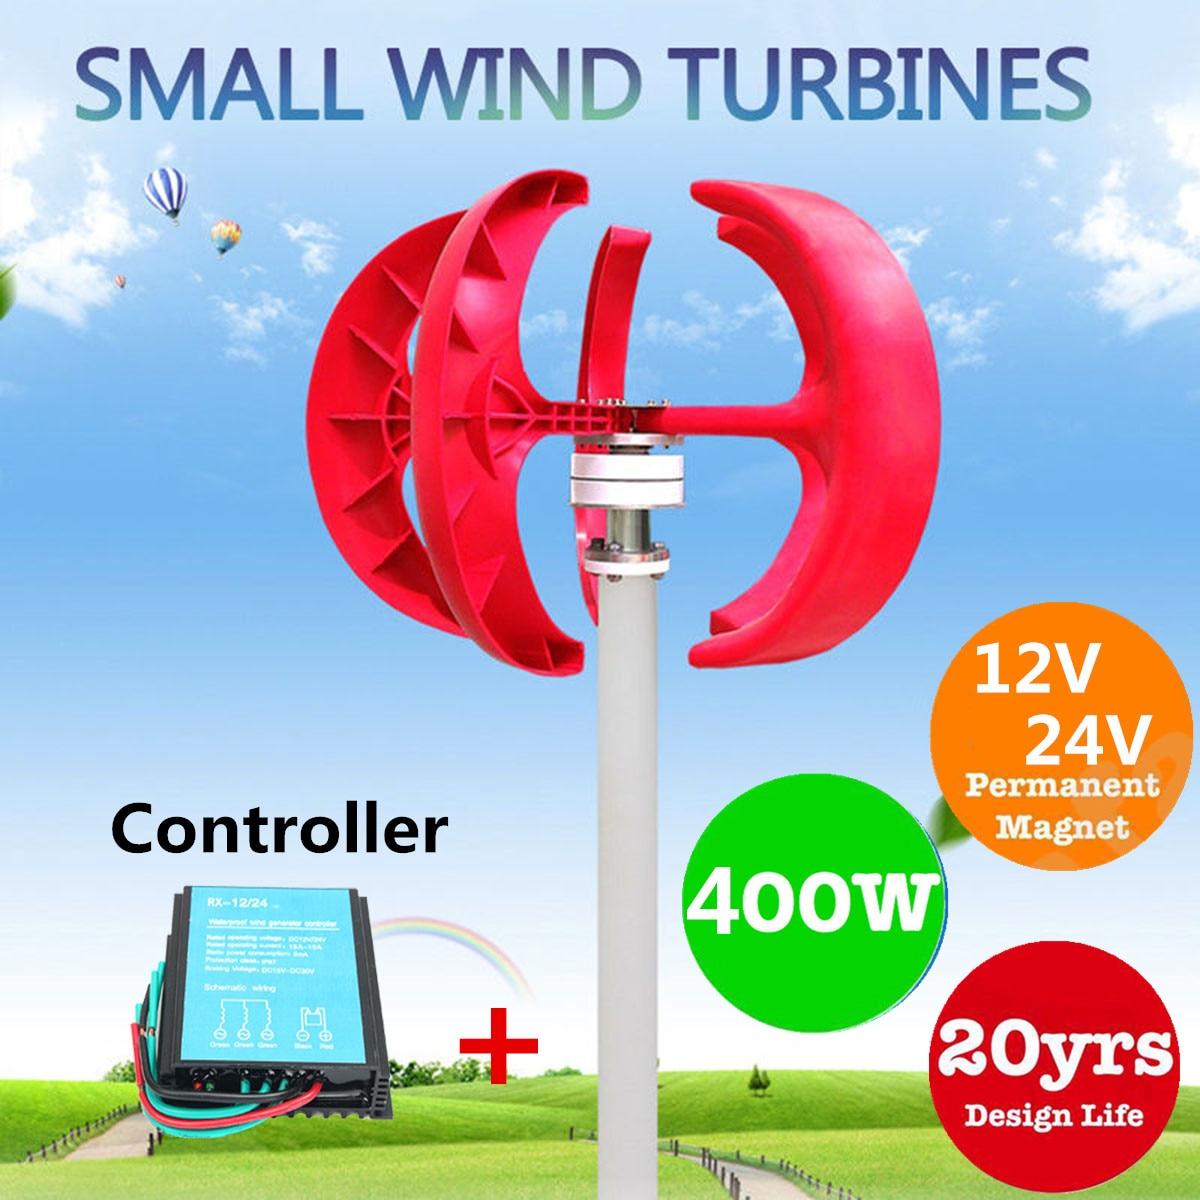 12V/24V 400W Lanterns Wind Power Generator Turbine 5 Blades Permanent Magnet Generator + 600W Wind Turbine Generator Controller 100w 200w 300w 400w lantern wind turbine generator dc 12v 24v wind power permanent magnet generator 600w wind energy controller